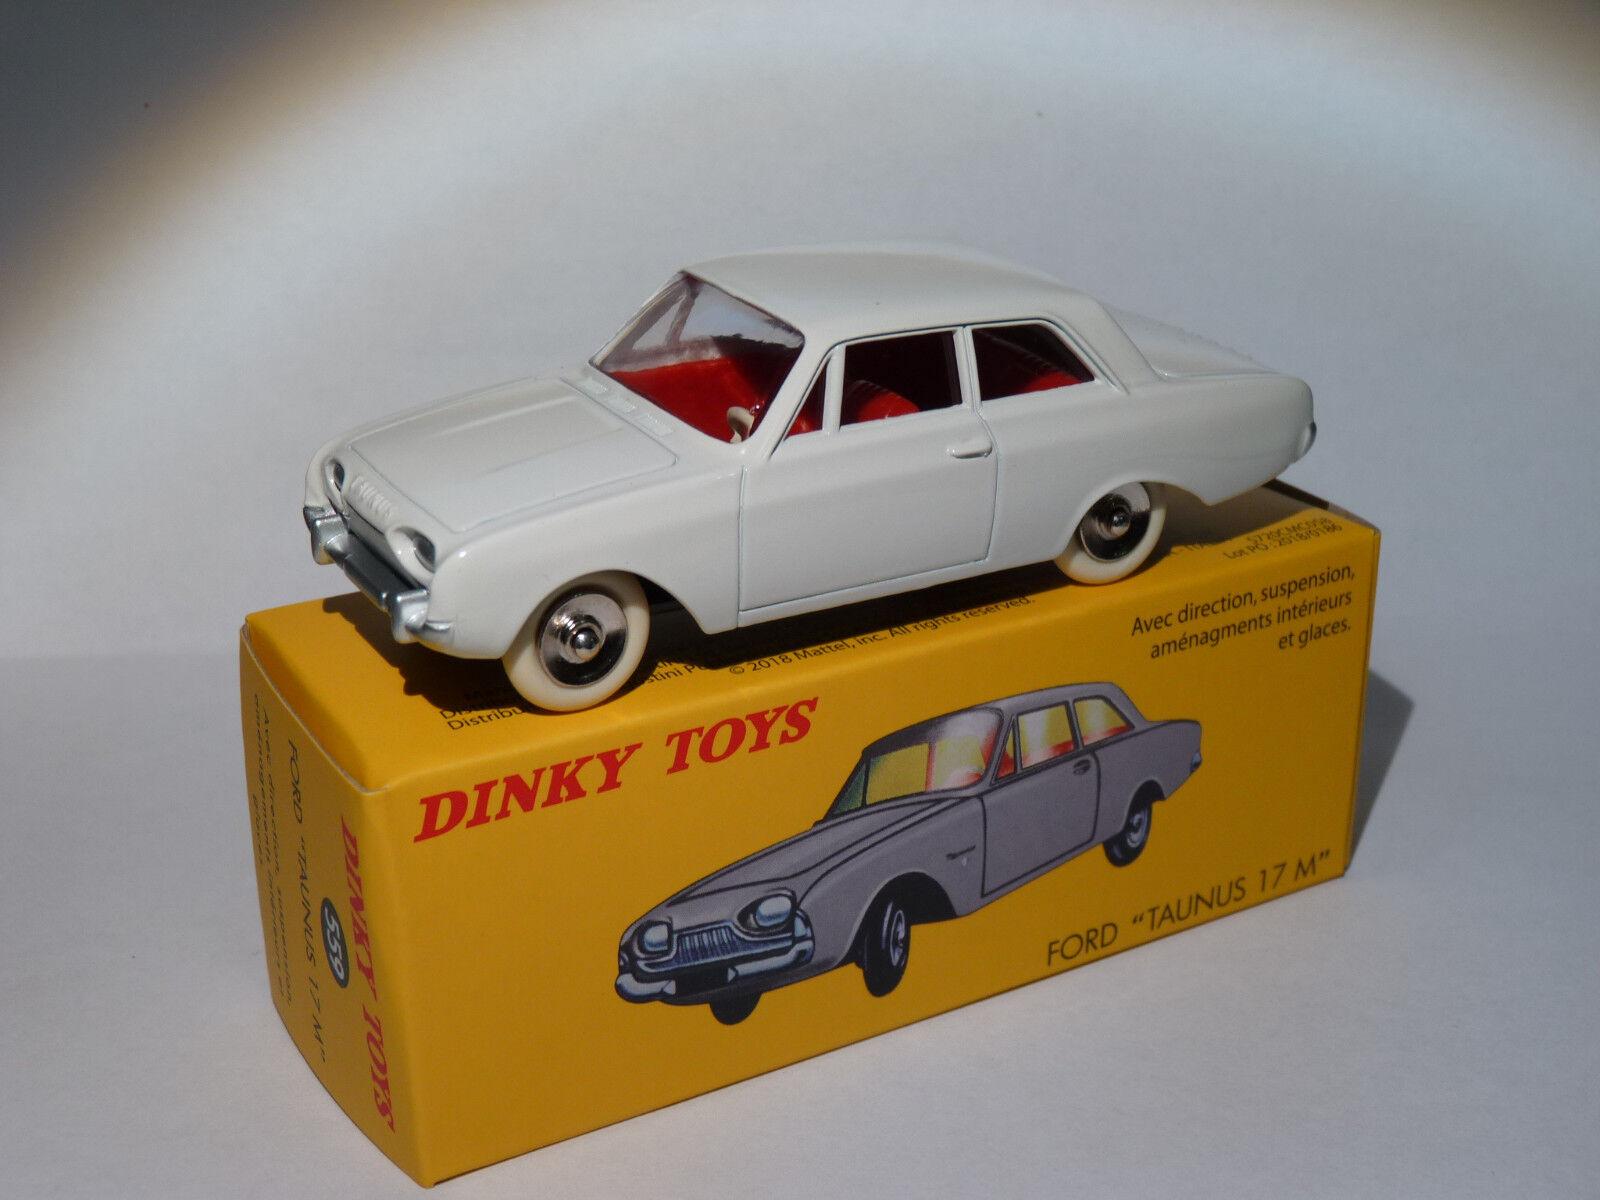 2nd choice   Ford Taunus 55 10 12ft   55 ref. 559 au 1 43 dinky toys DeAgostini